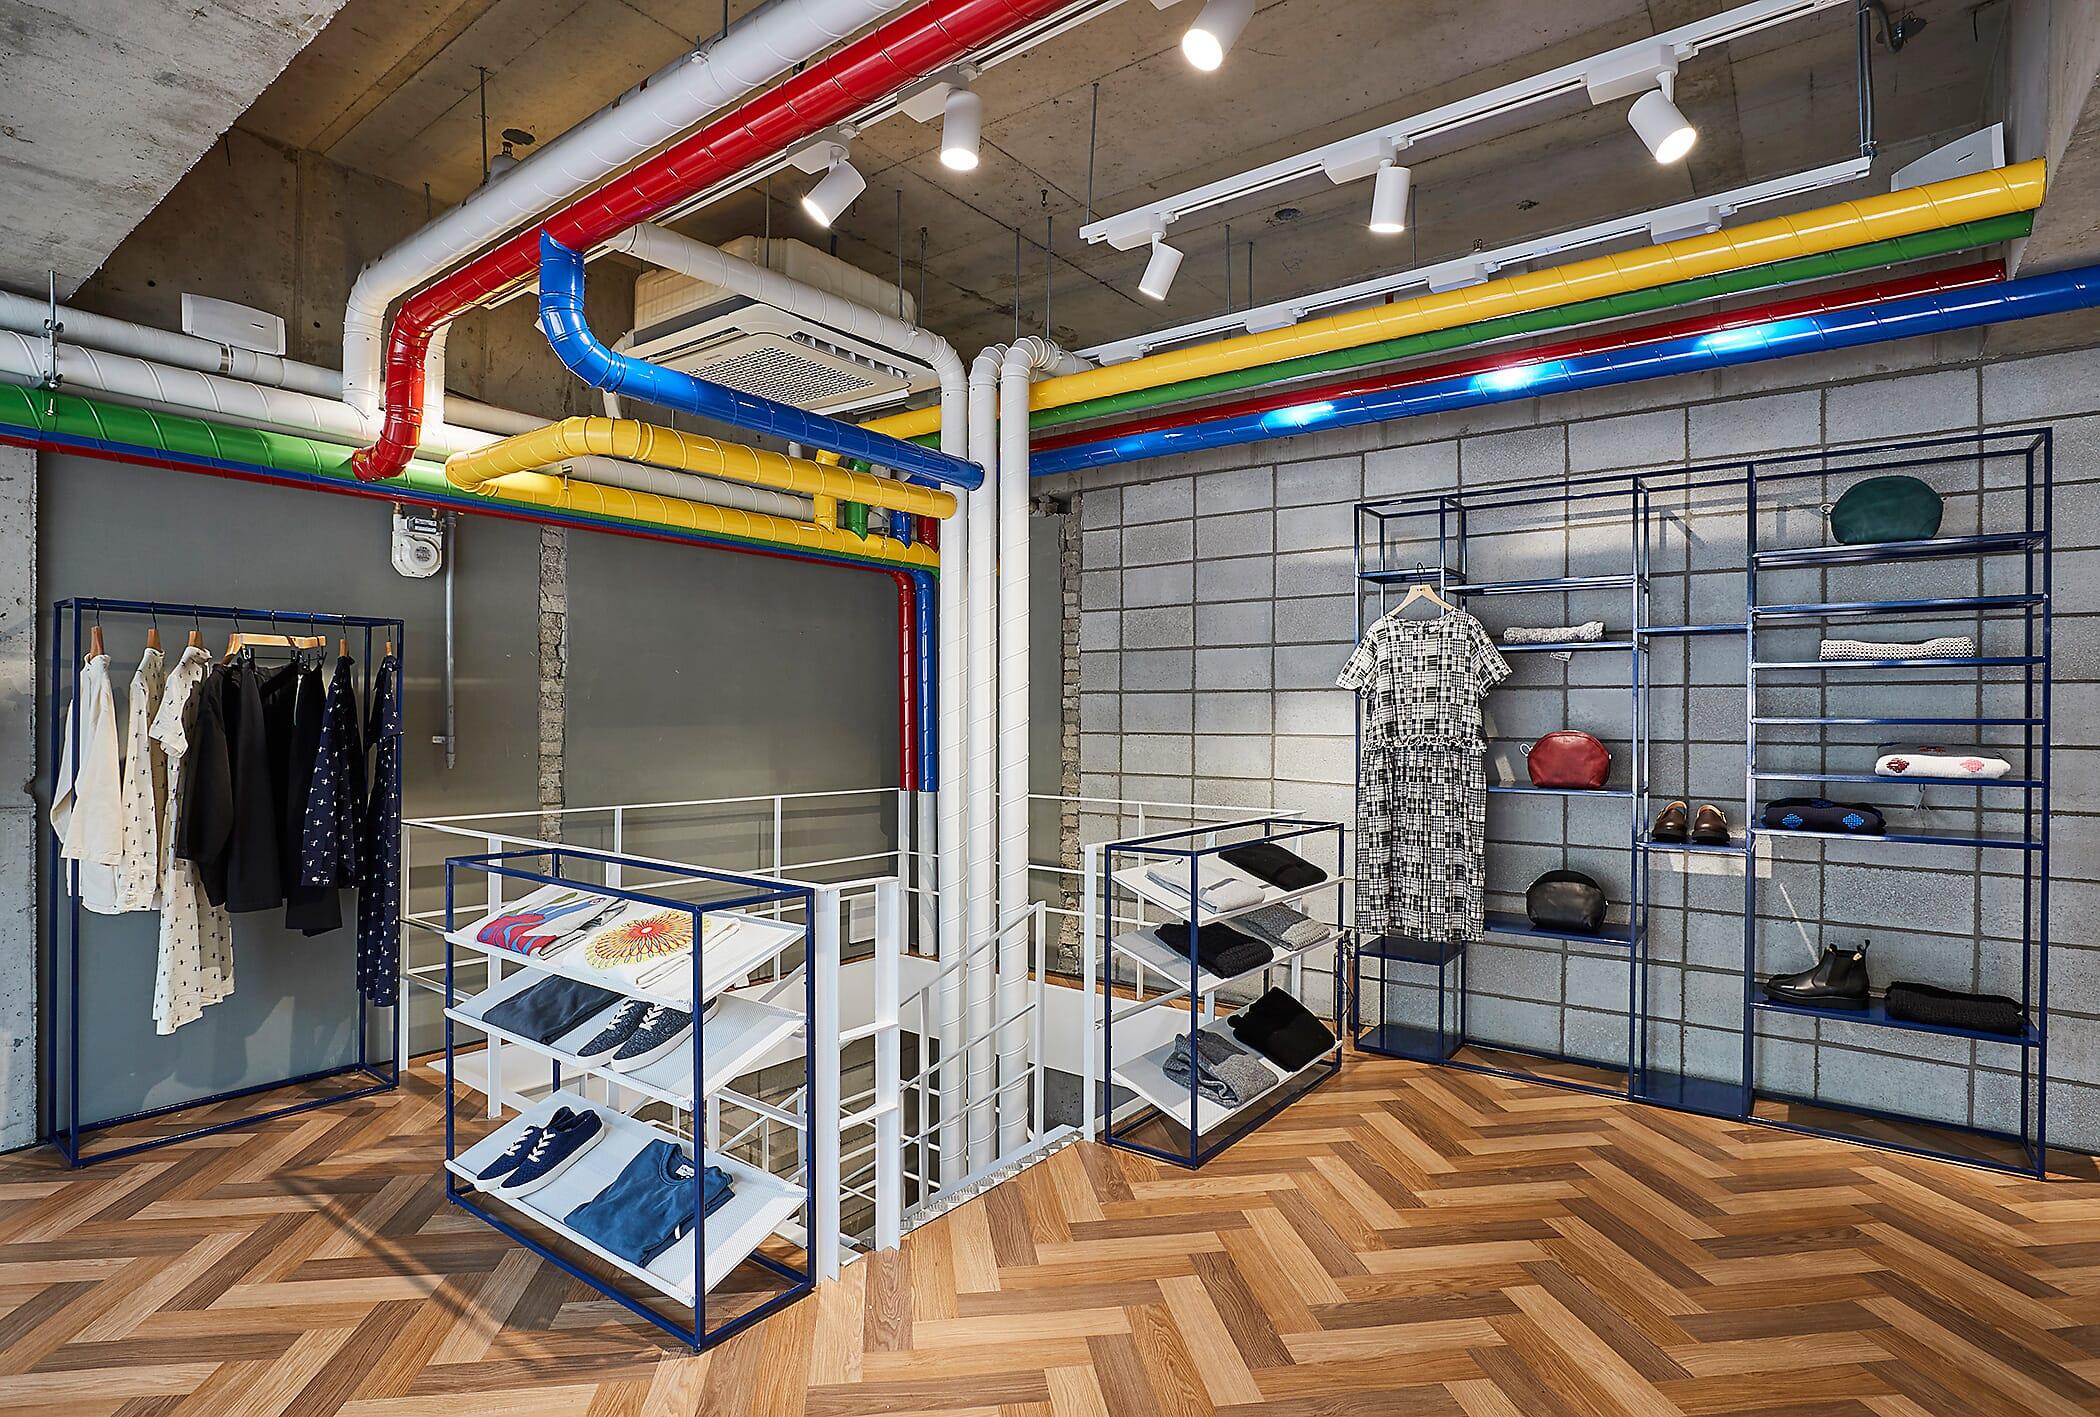 ymc-seoul_aw16-store-renewal_interior_1f_3